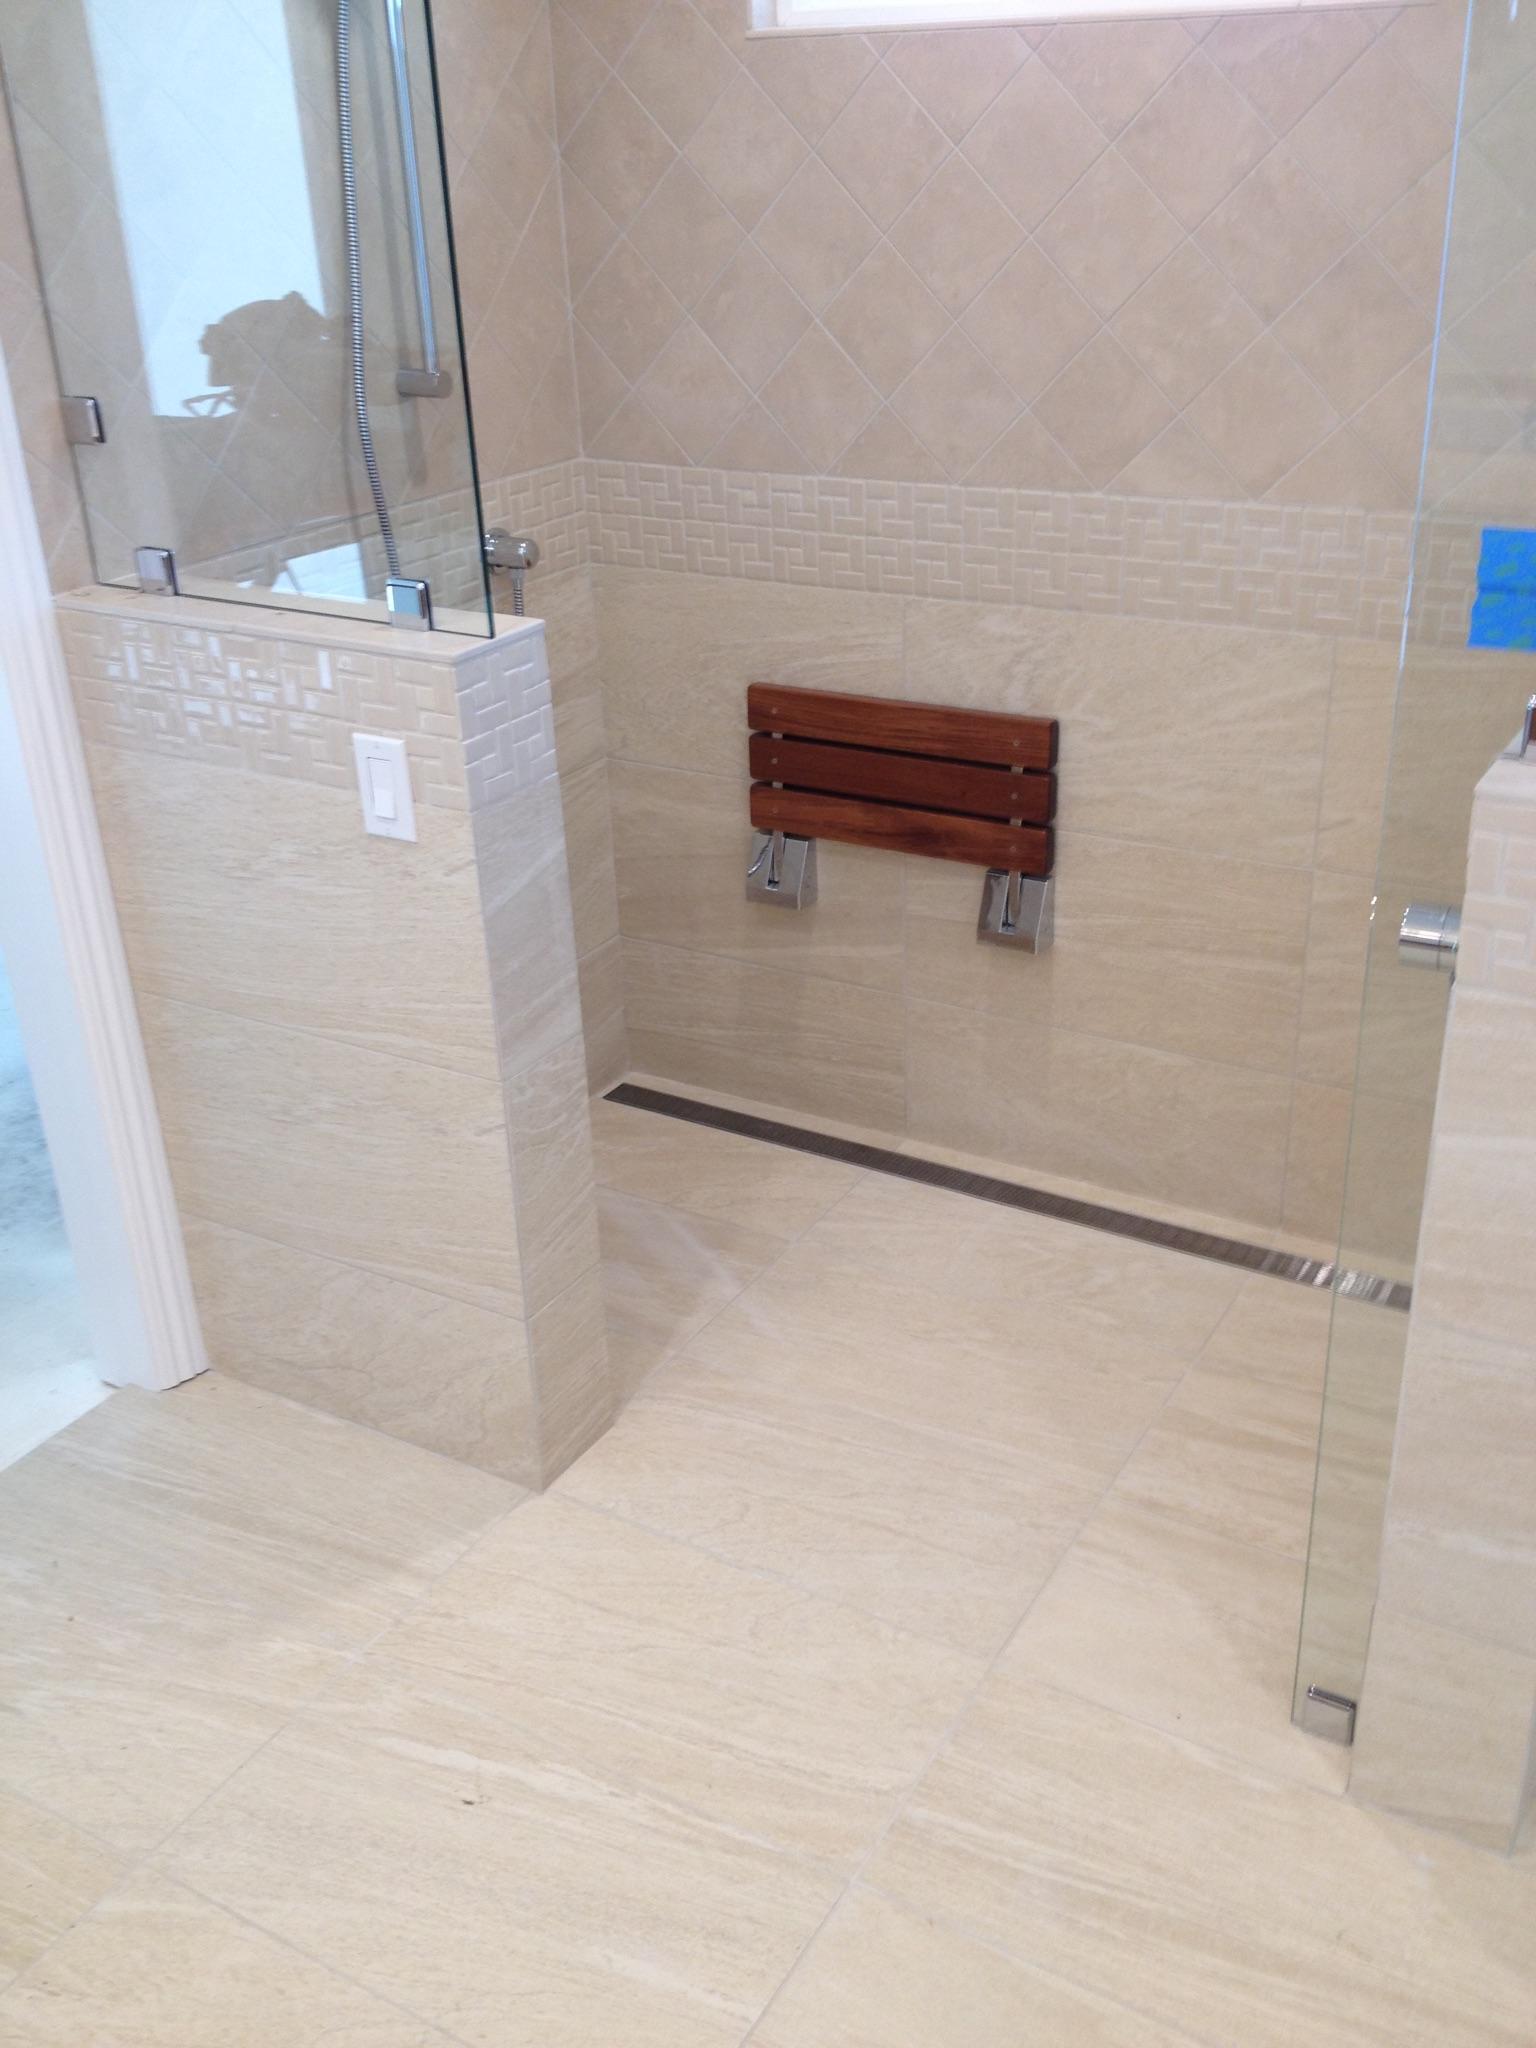 handicap shower linear drain teak bench